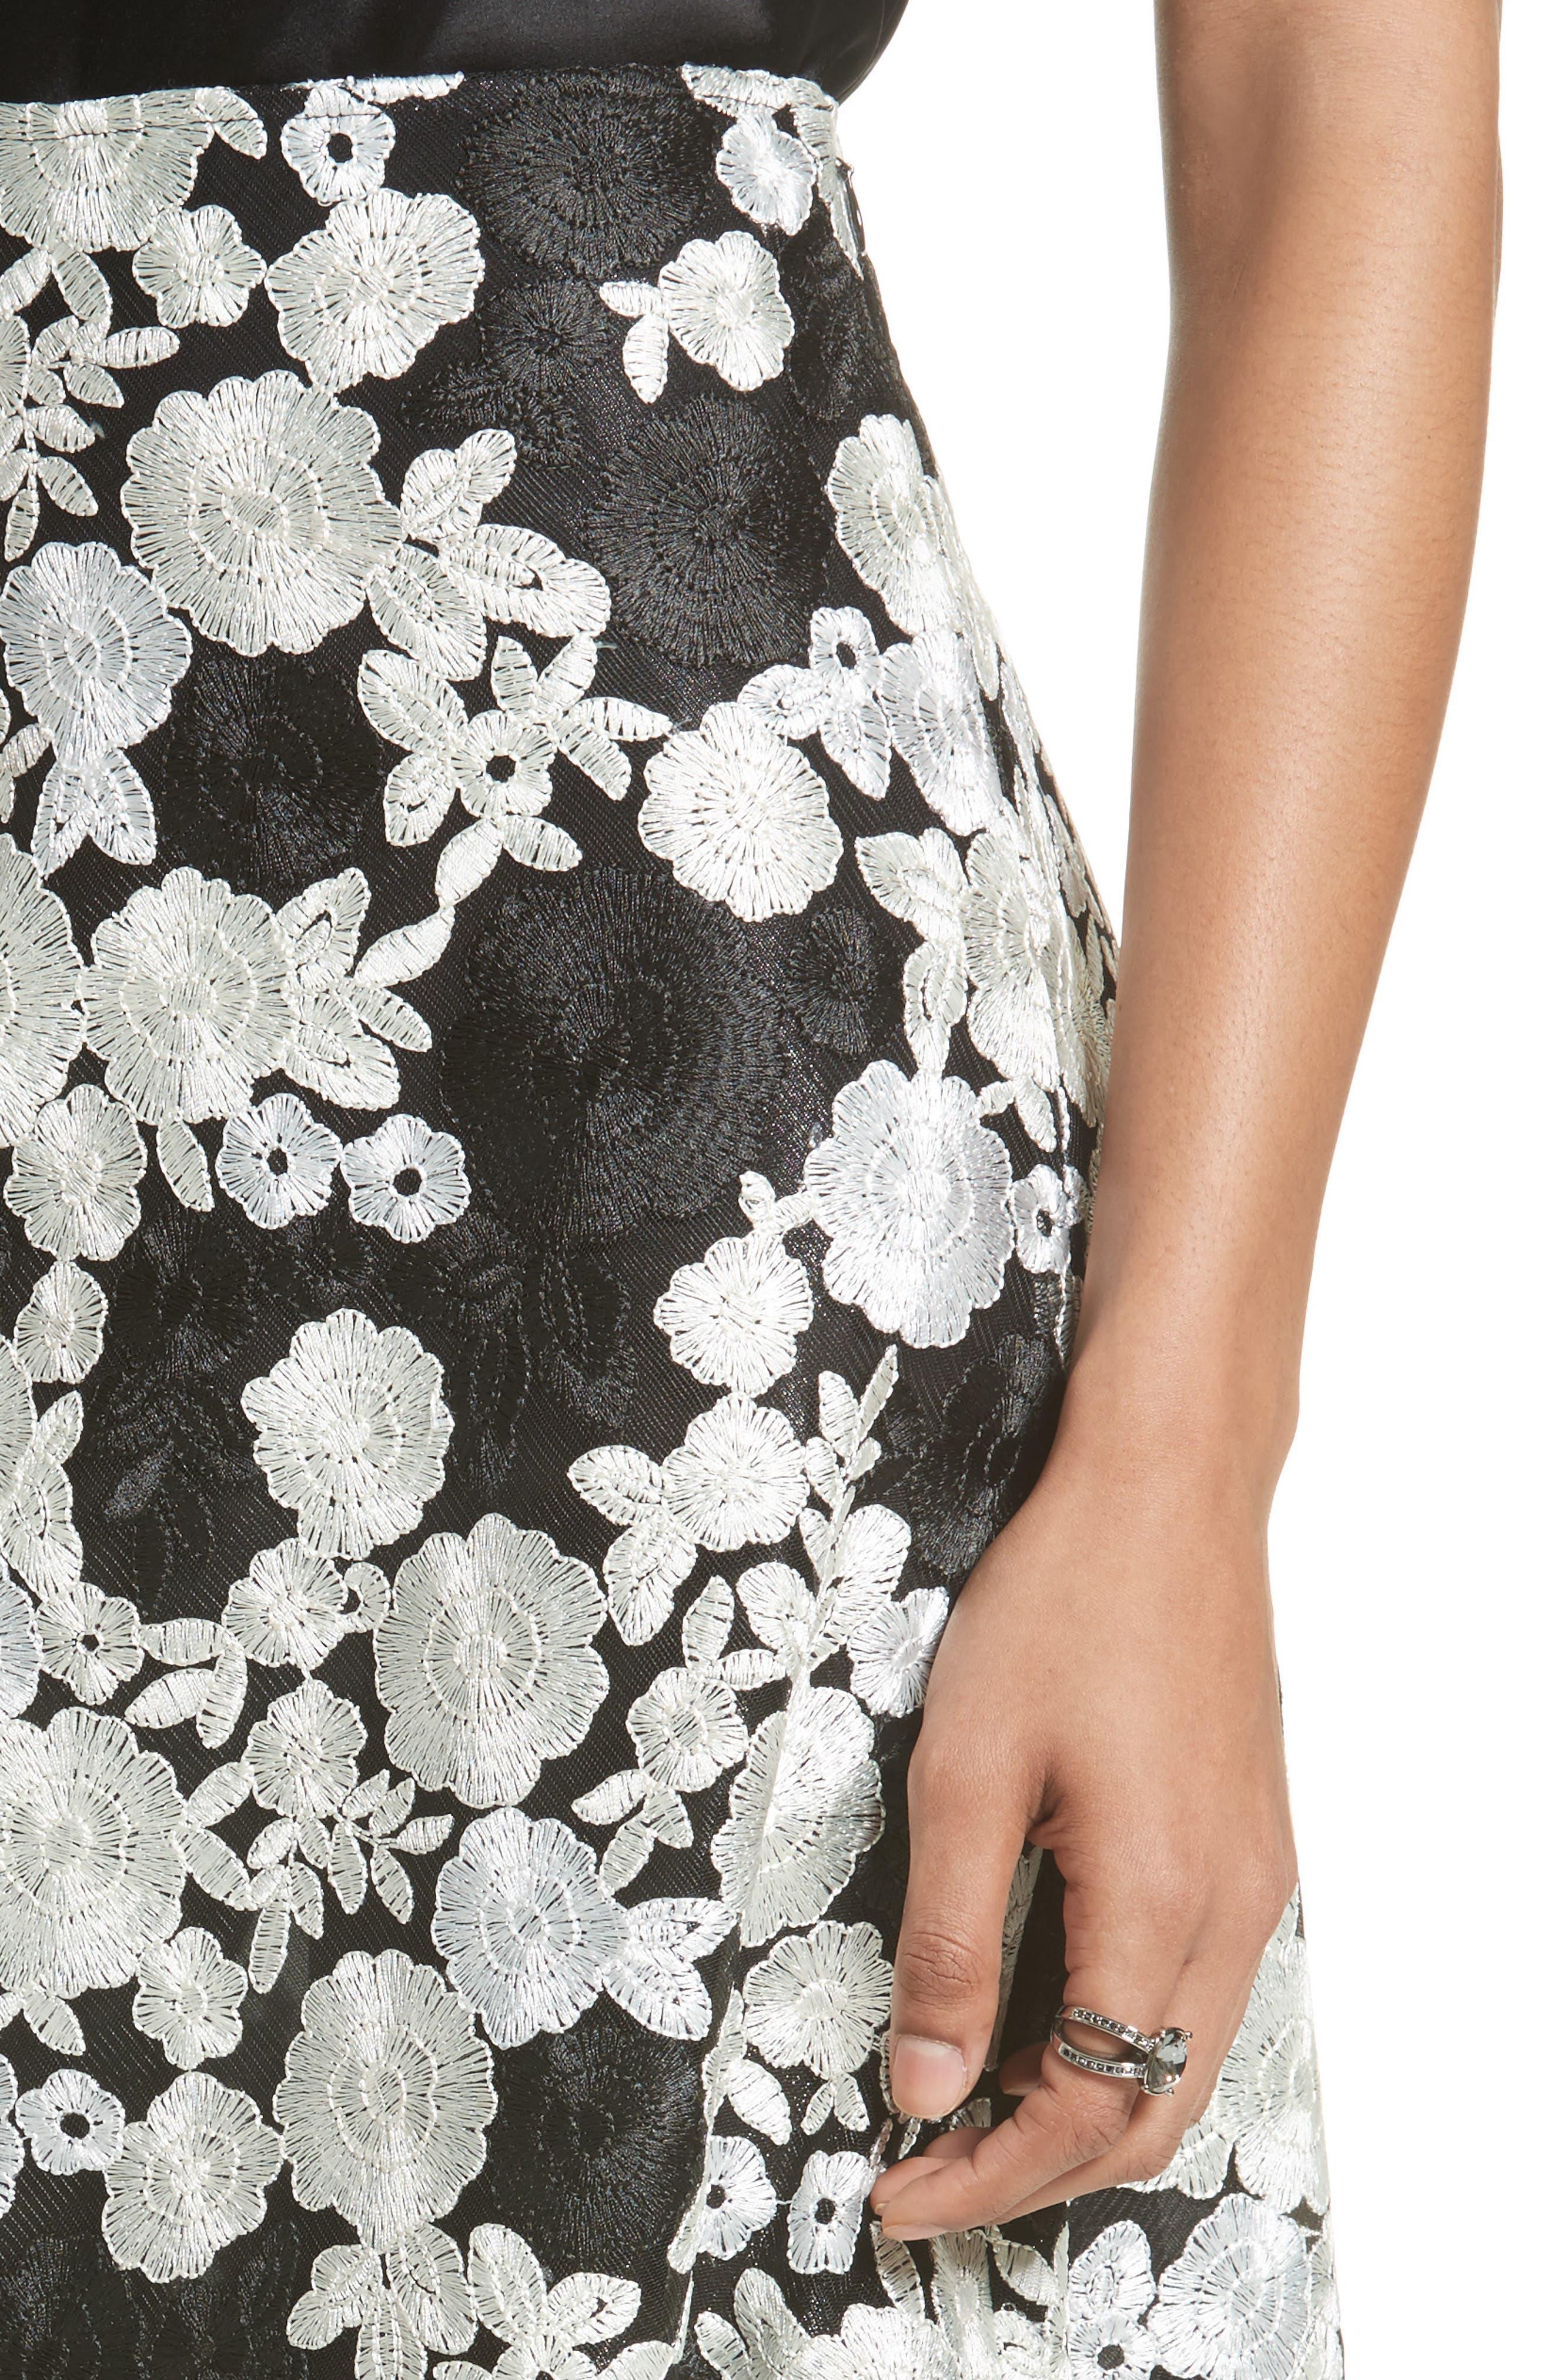 St. John Floral Embroidered Flared Skirt,                             Alternate thumbnail 4, color,                             001